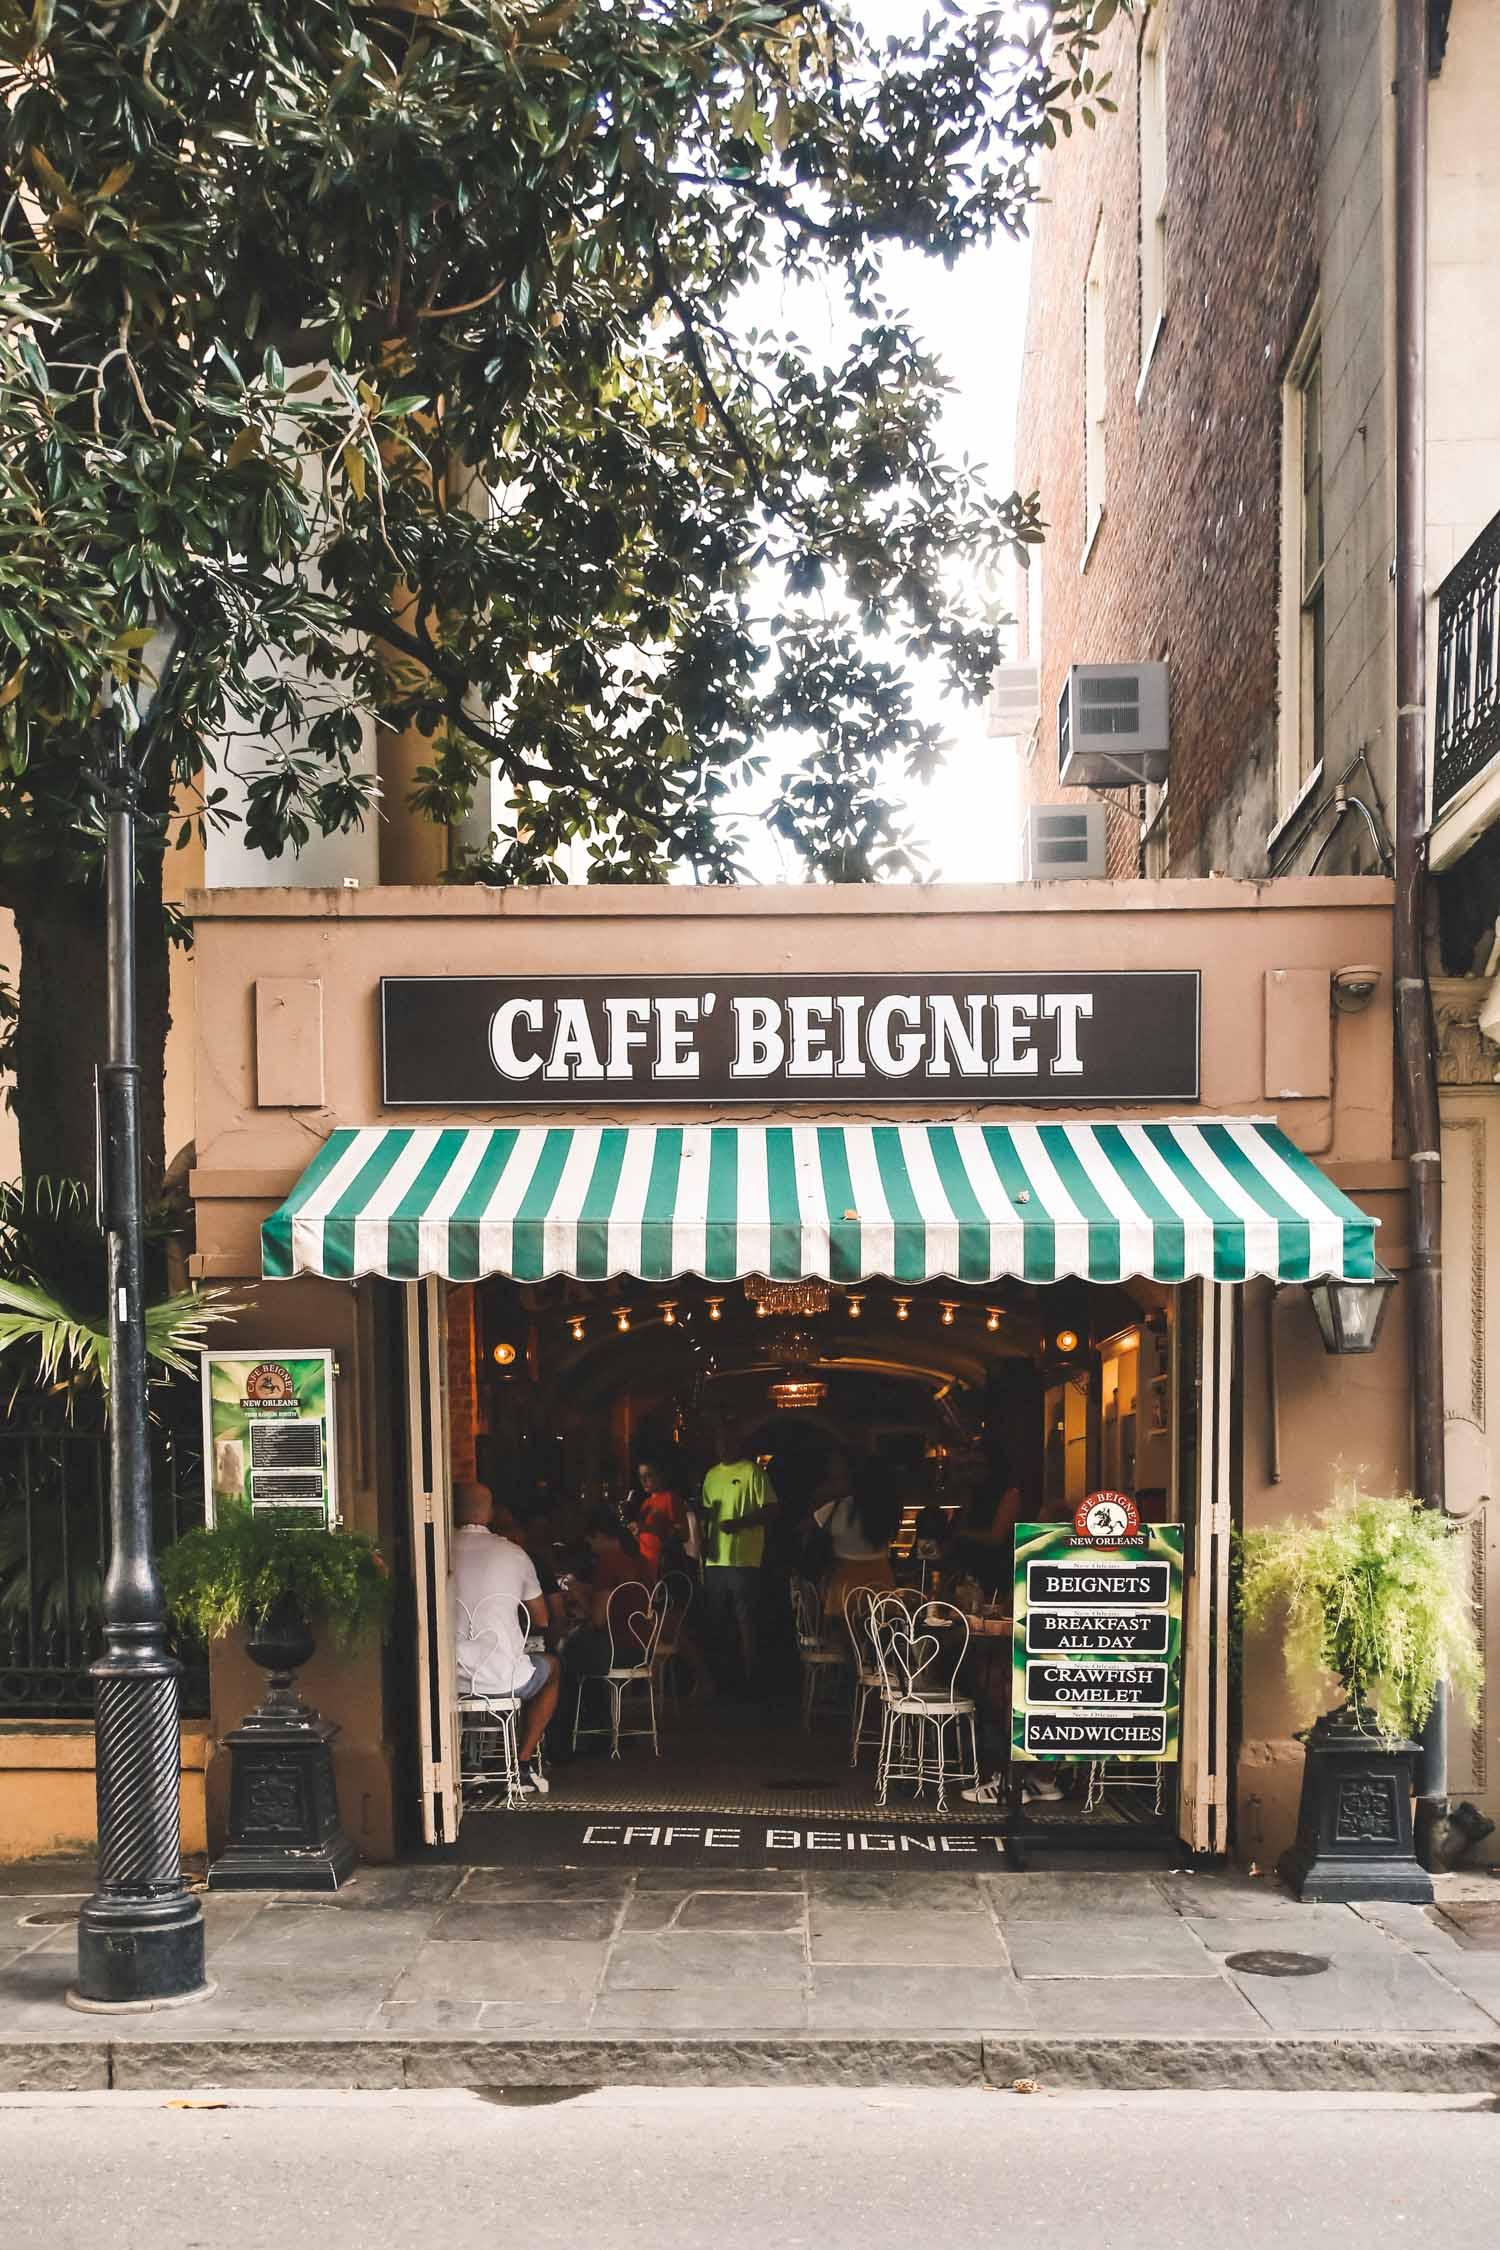 New Orleans Louisiana cafe beignet